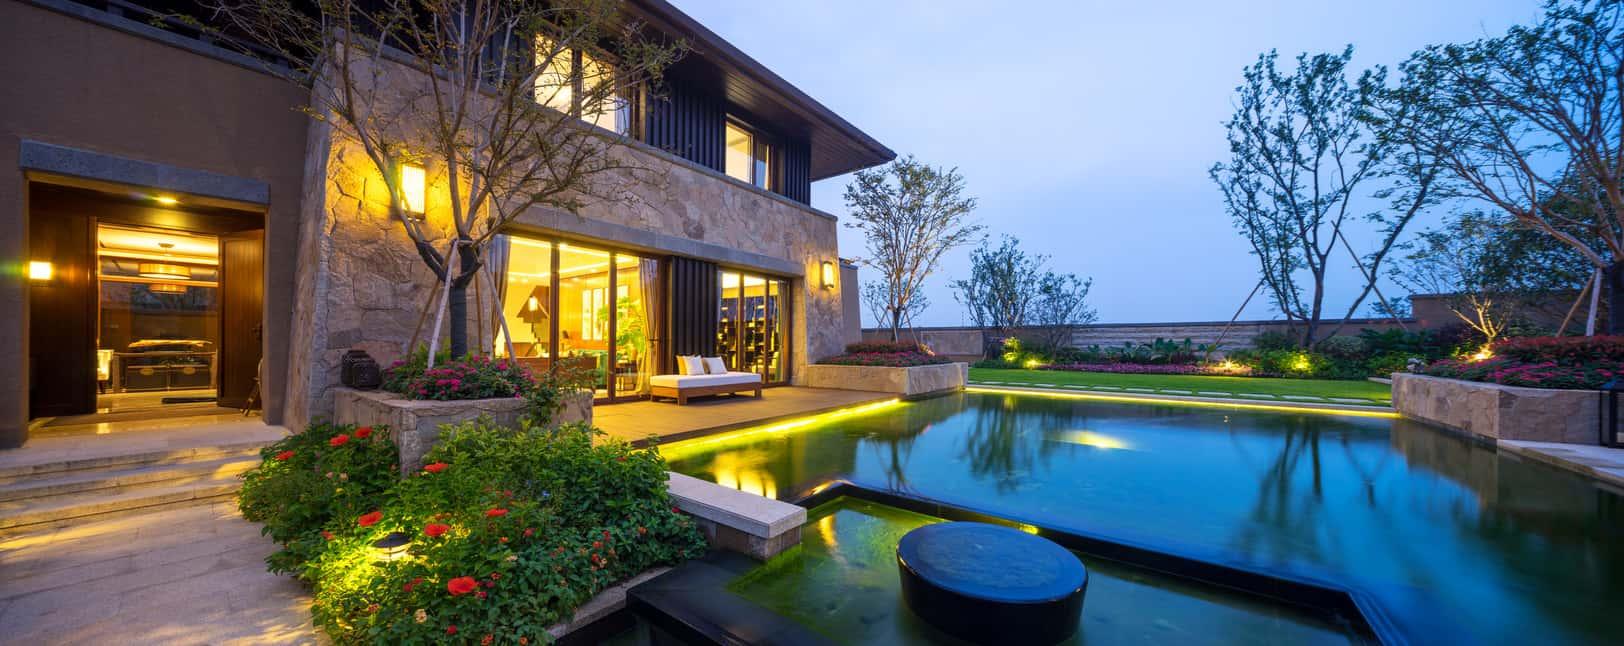 75 Brilliant Backyard Landscape Lighting Ideas 2020